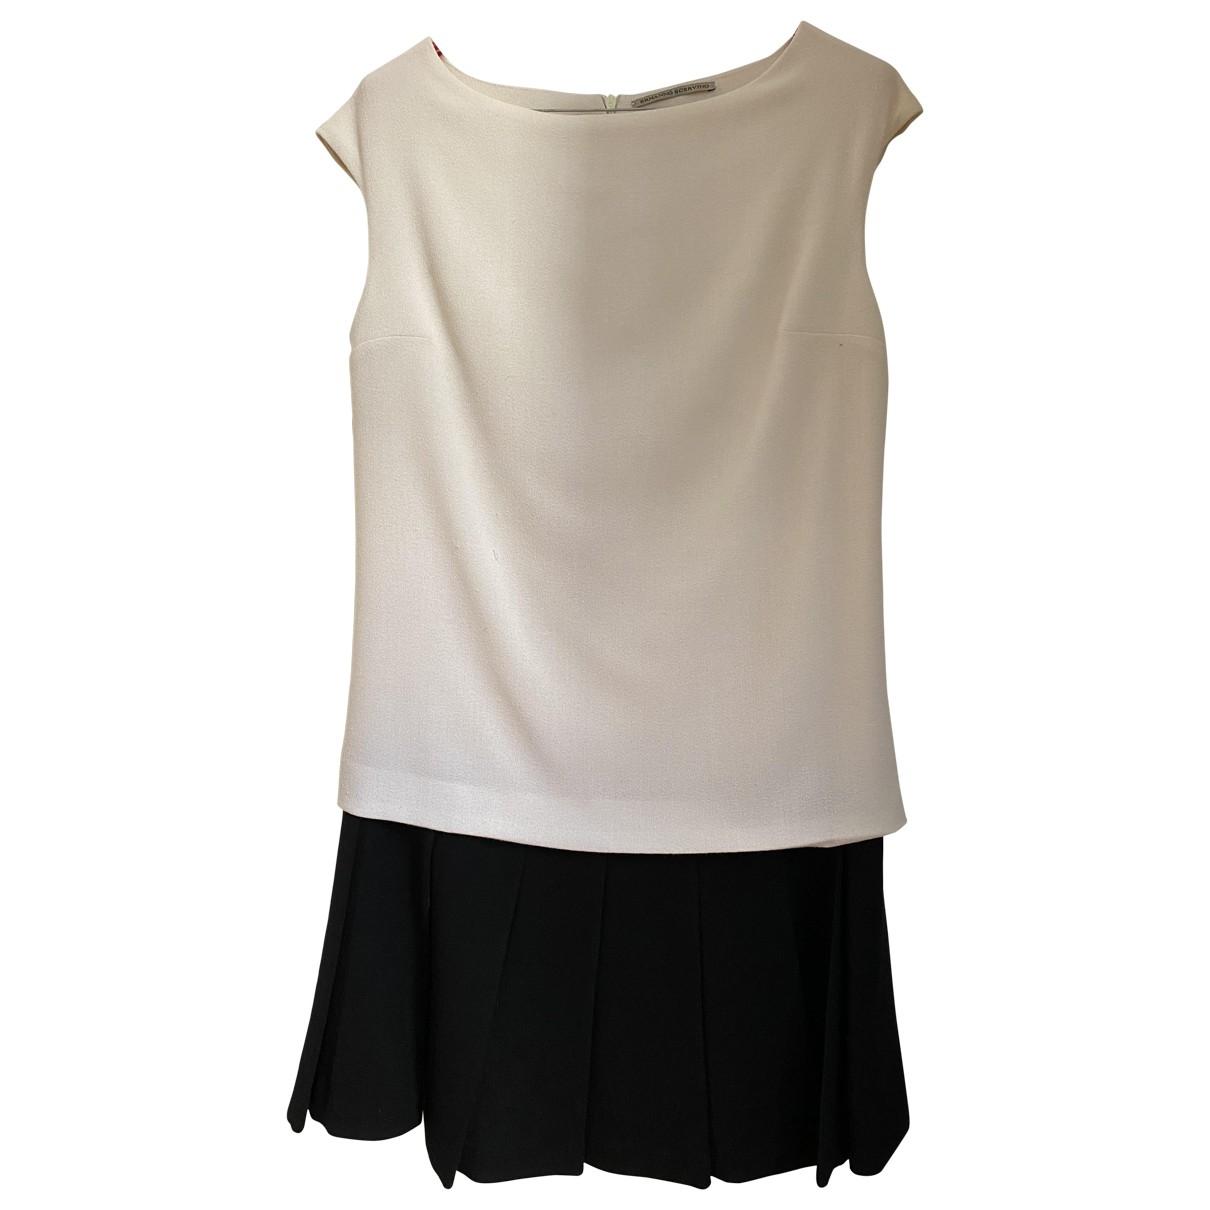 Ermanno Scervino \N White Wool dress for Women 38 IT